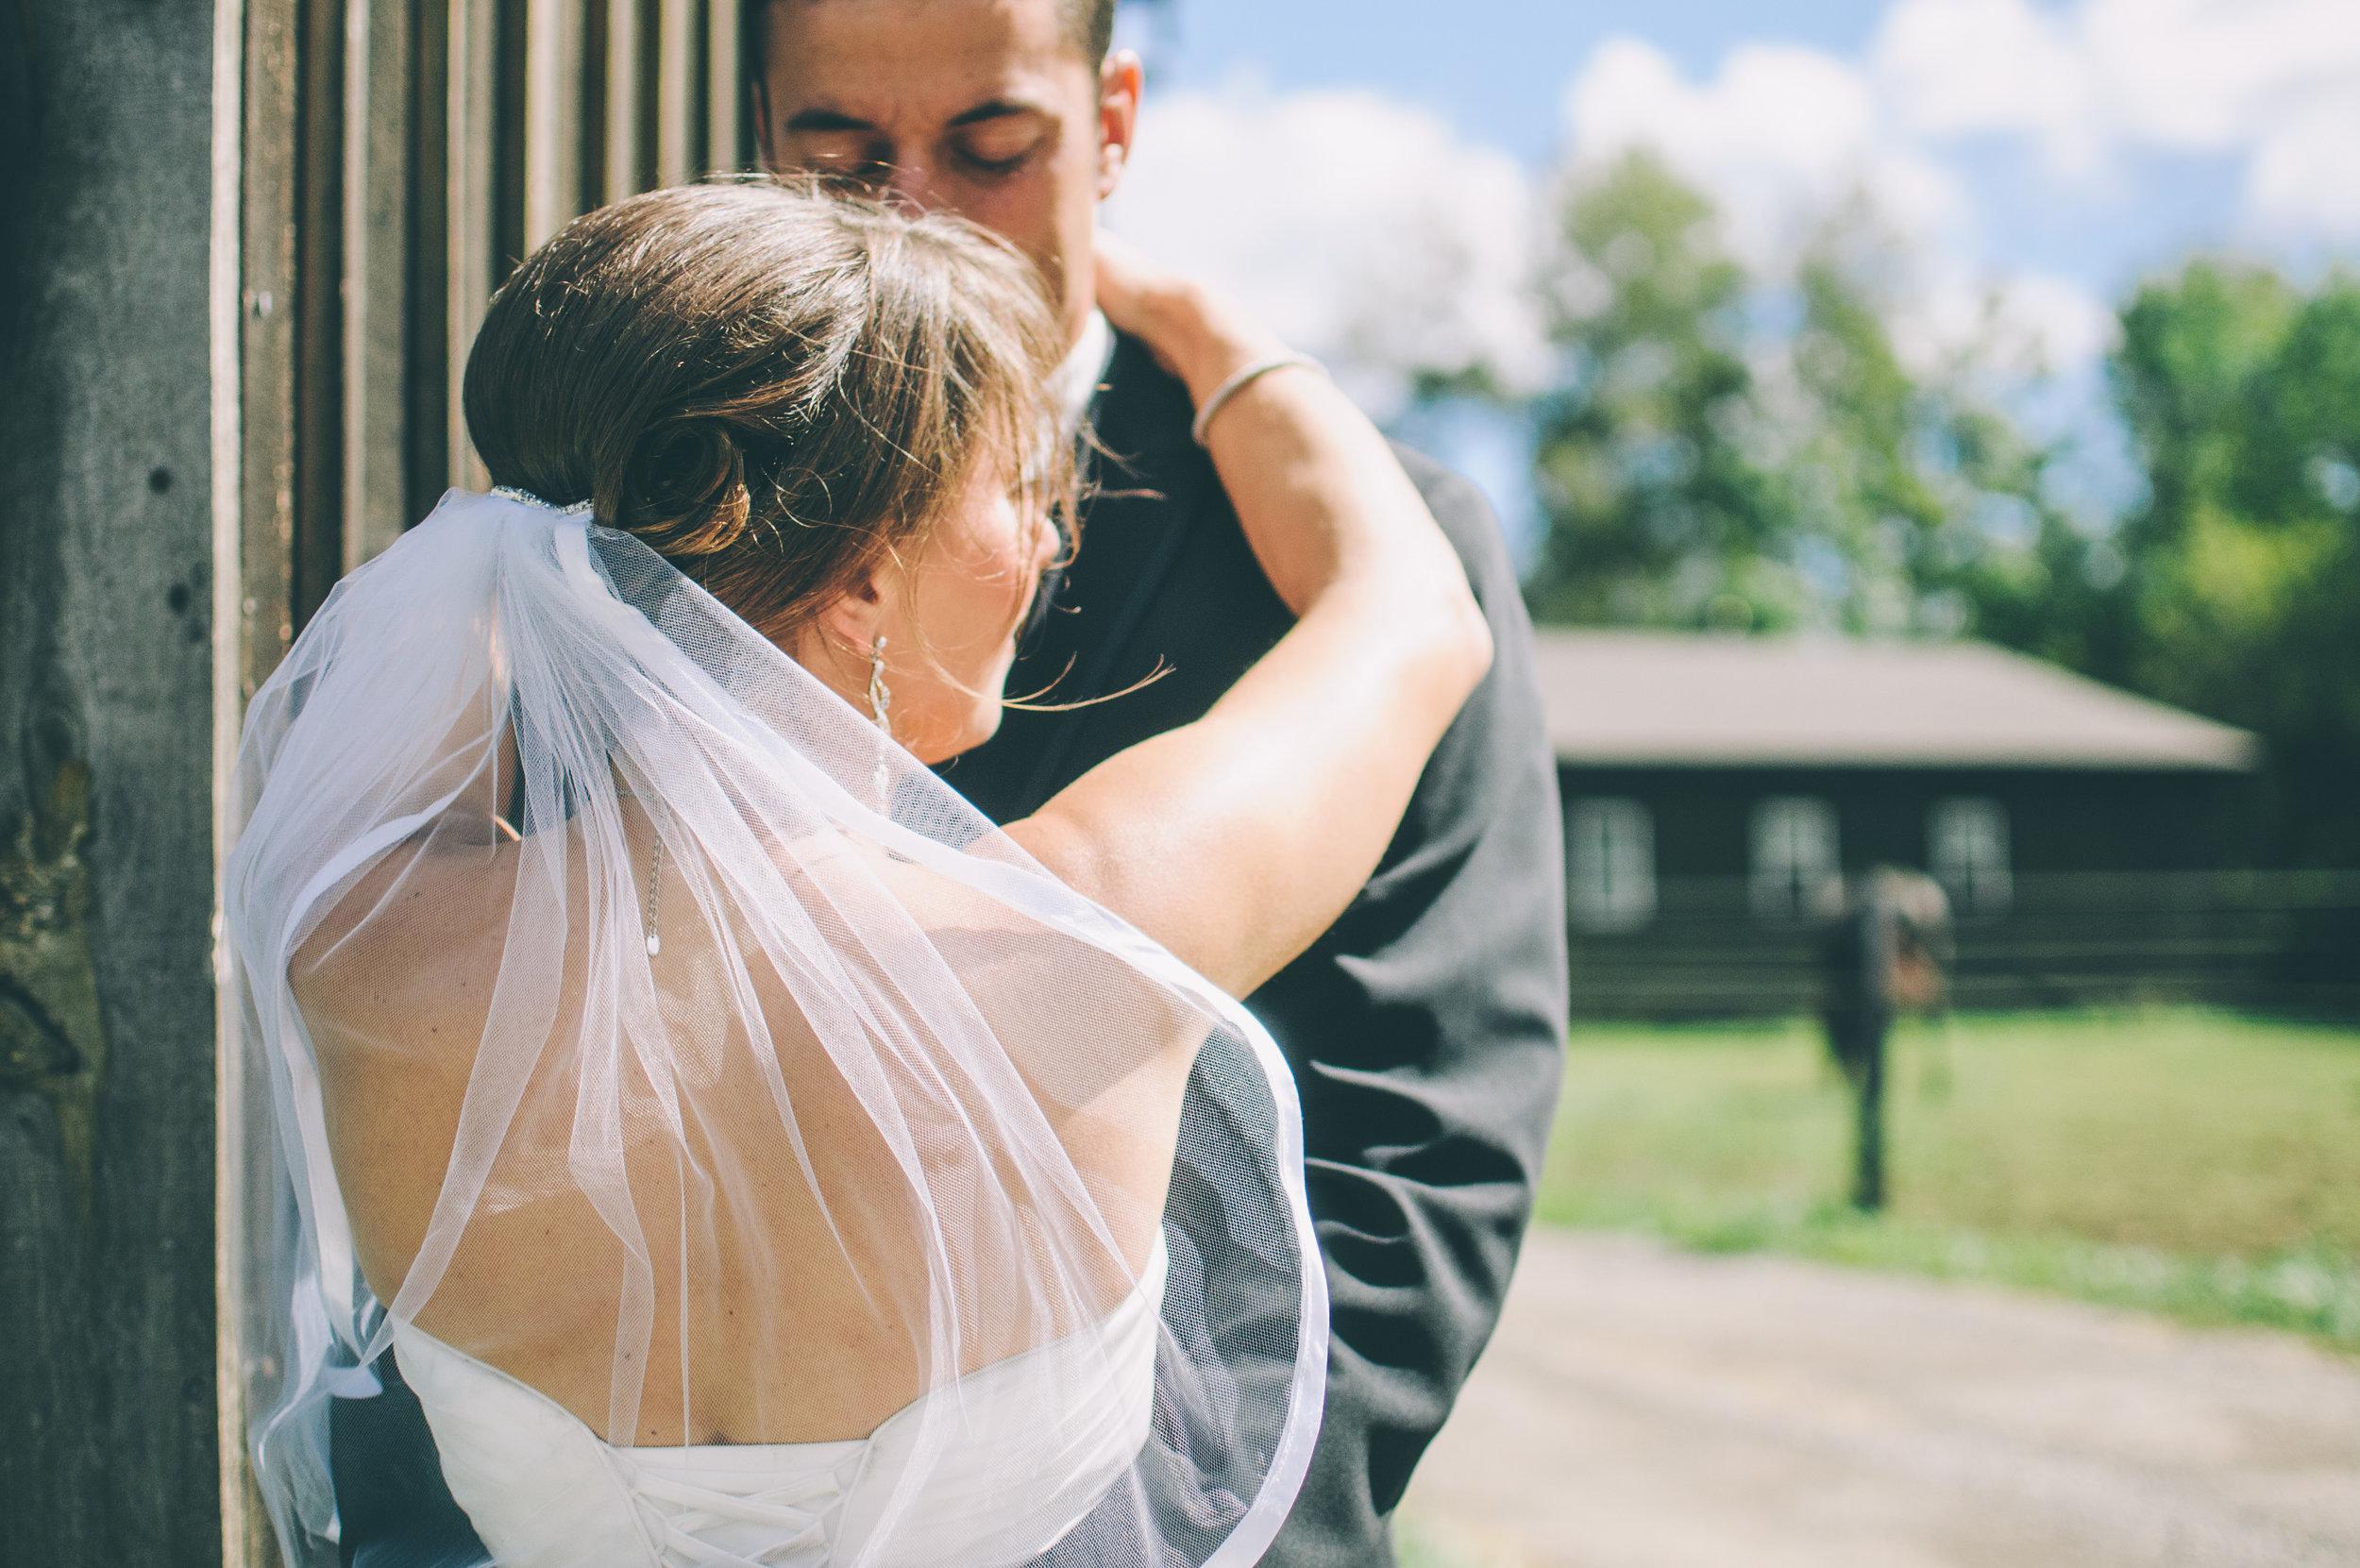 wedding Photography $1499 - 2 PHOTOGRAPHERS/ 8 HOURS